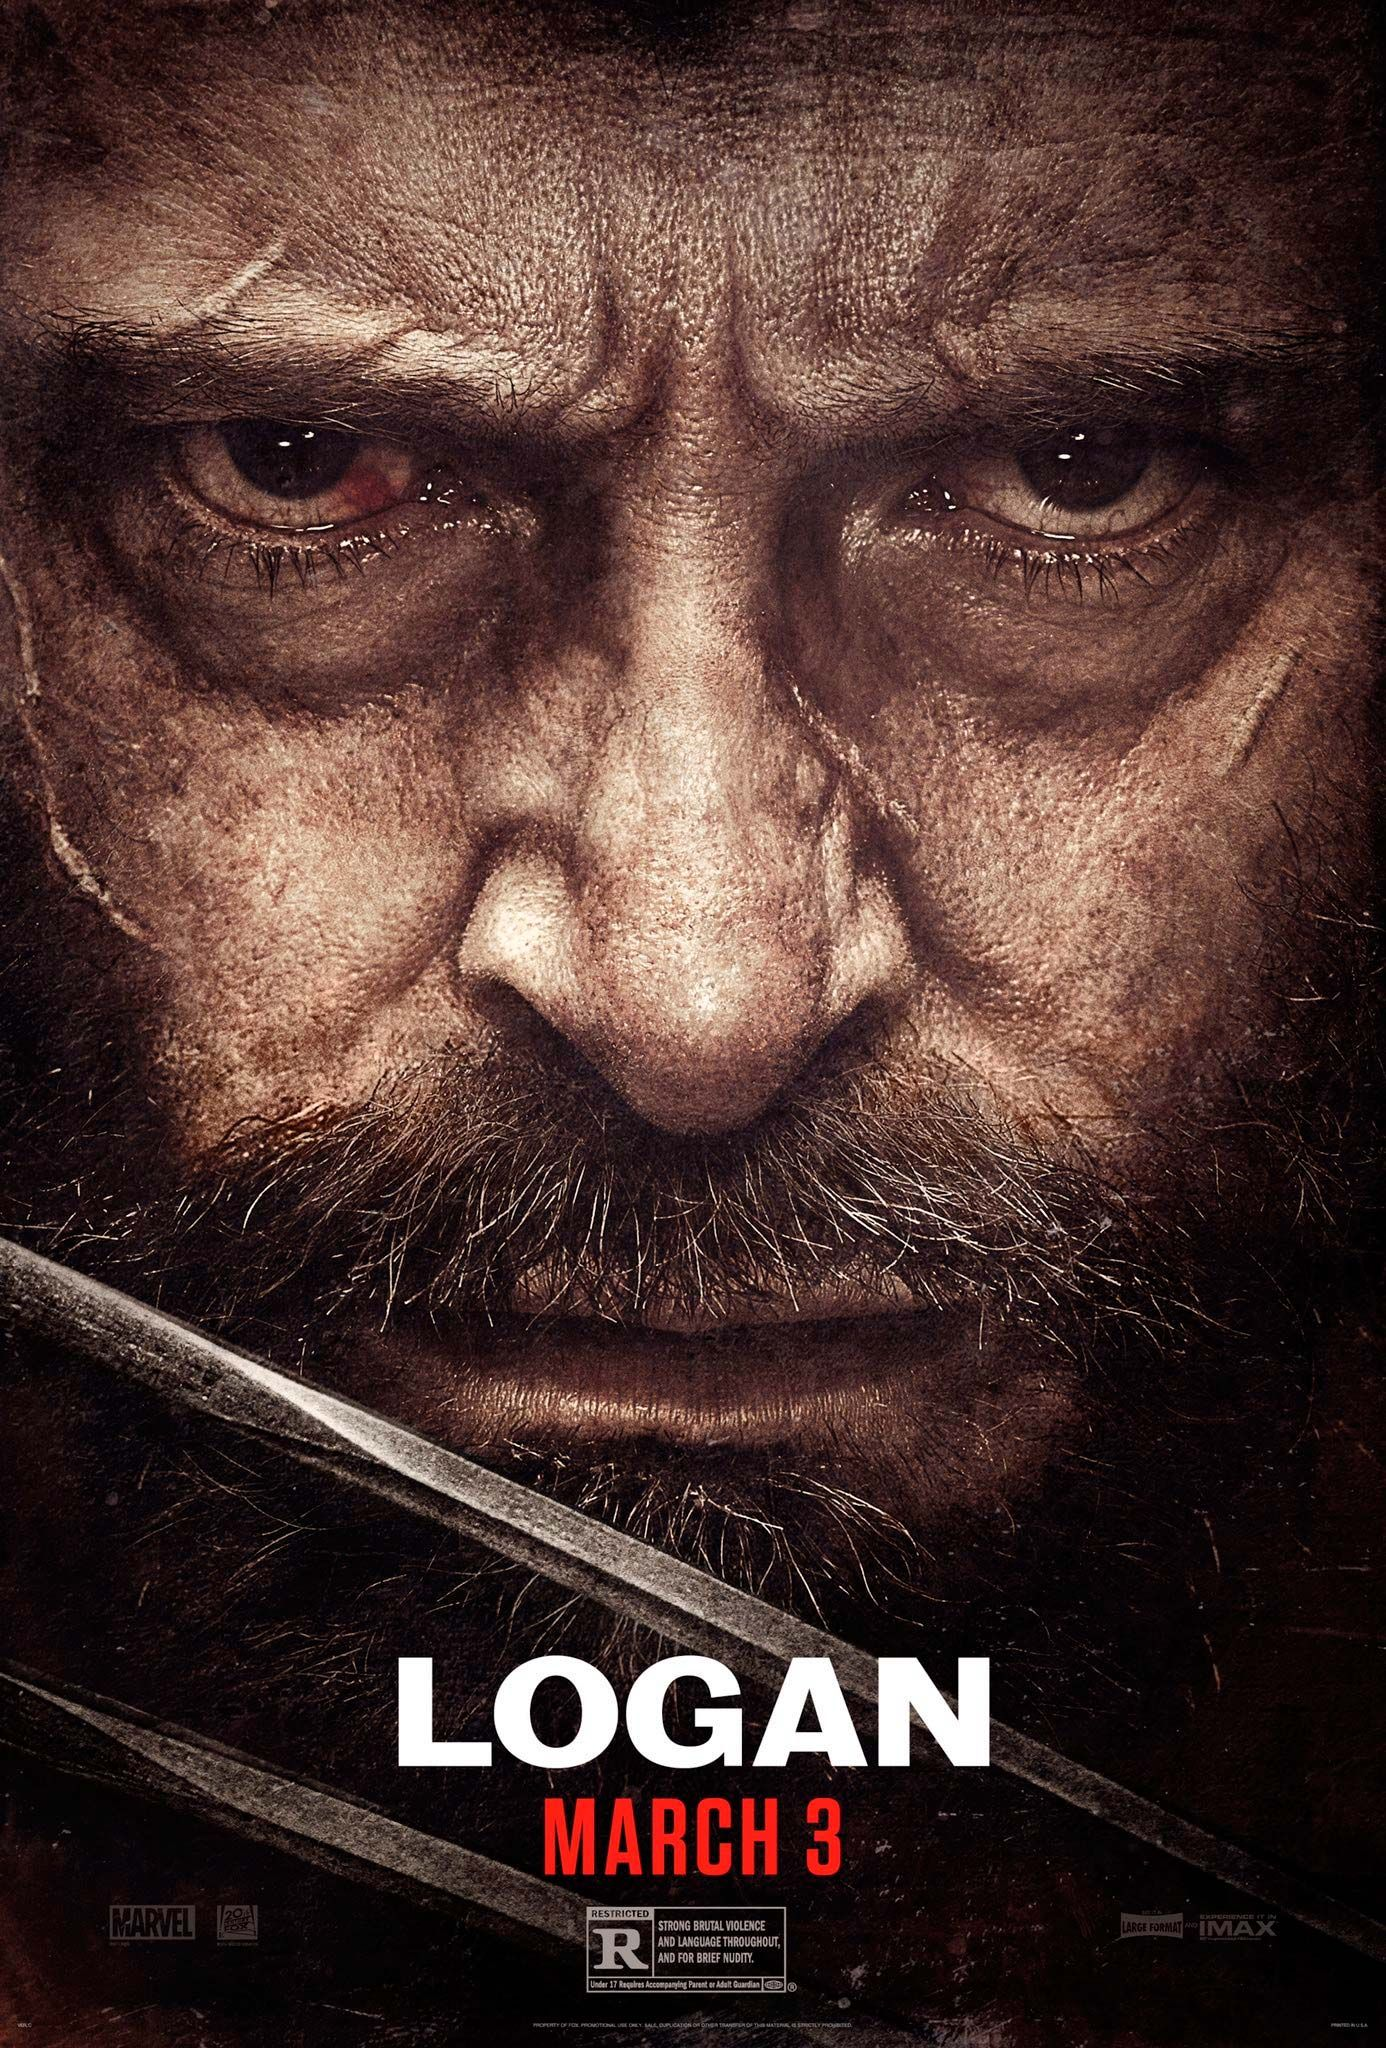 Cartel de \'Logan\' | Carteles de Cine | Pinterest | Cartelitos y Cine